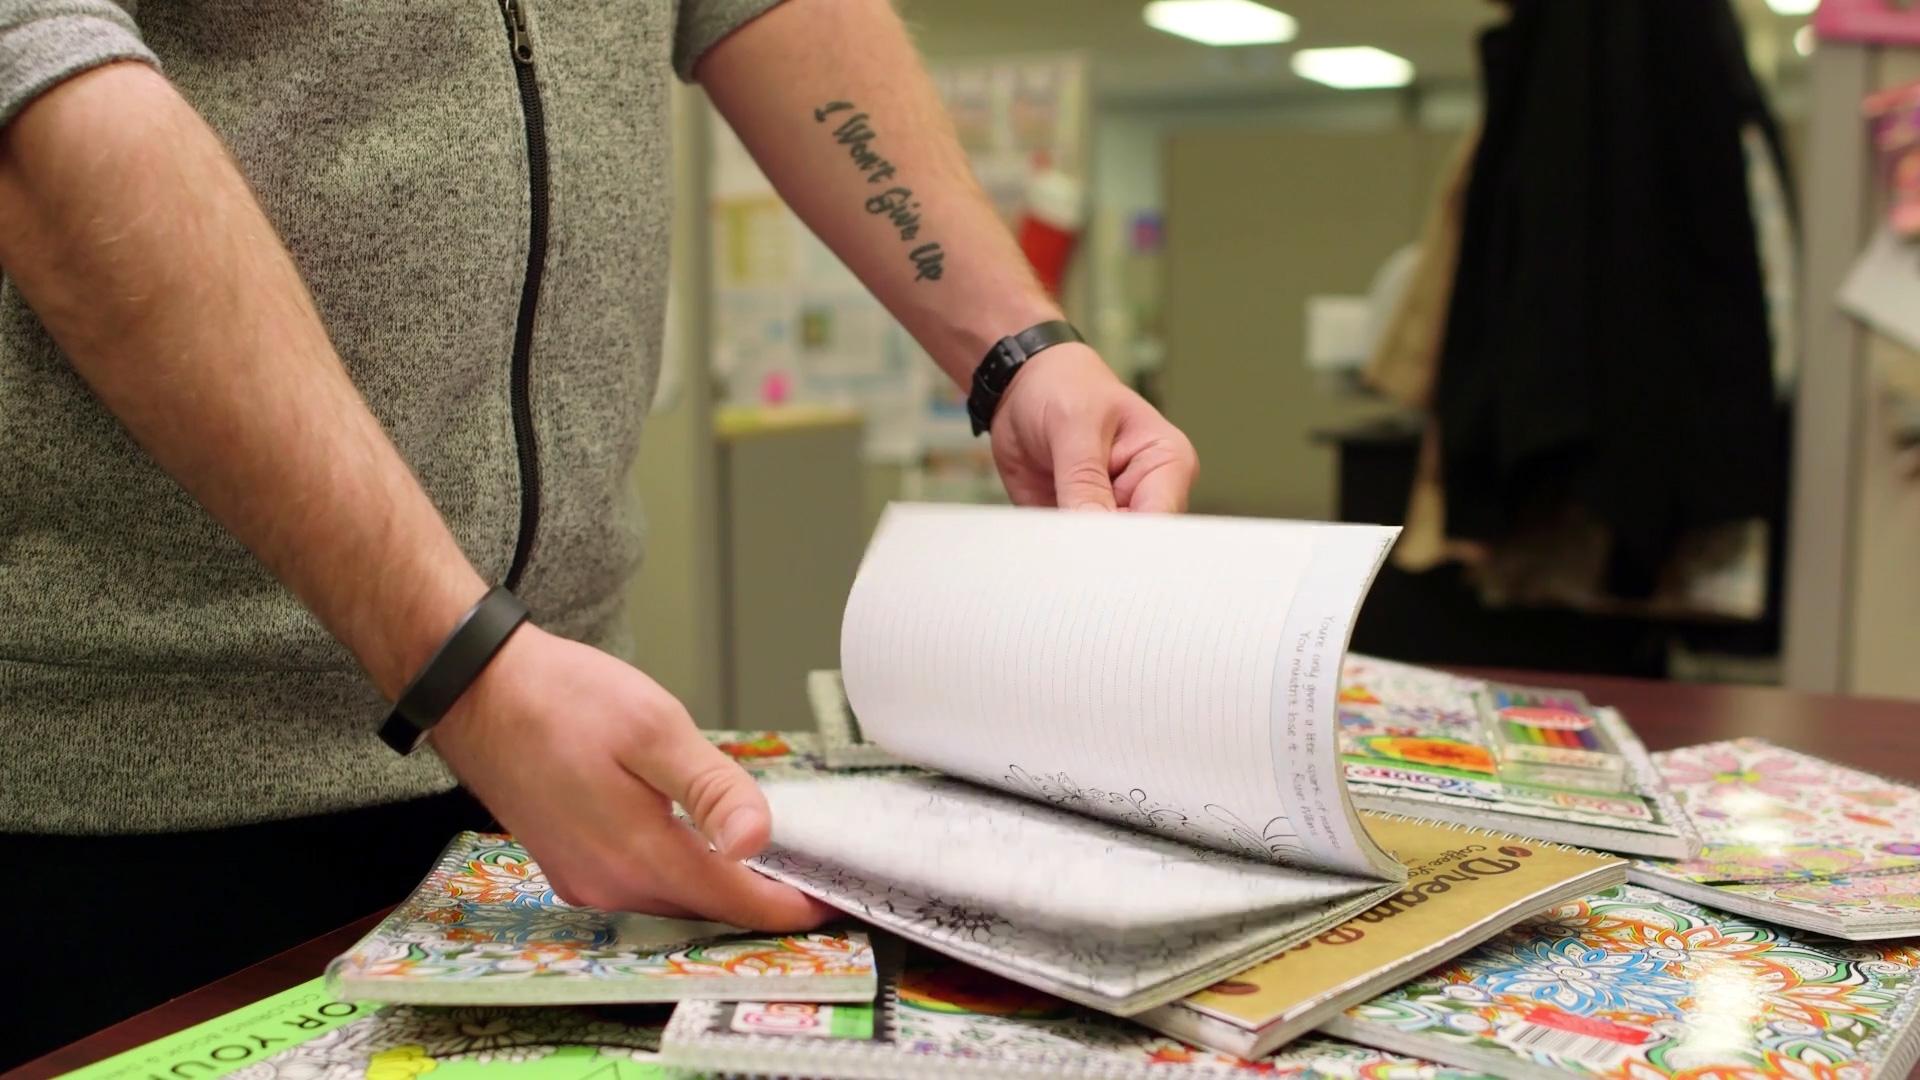 SDI Innovations employee flipping through notebook.